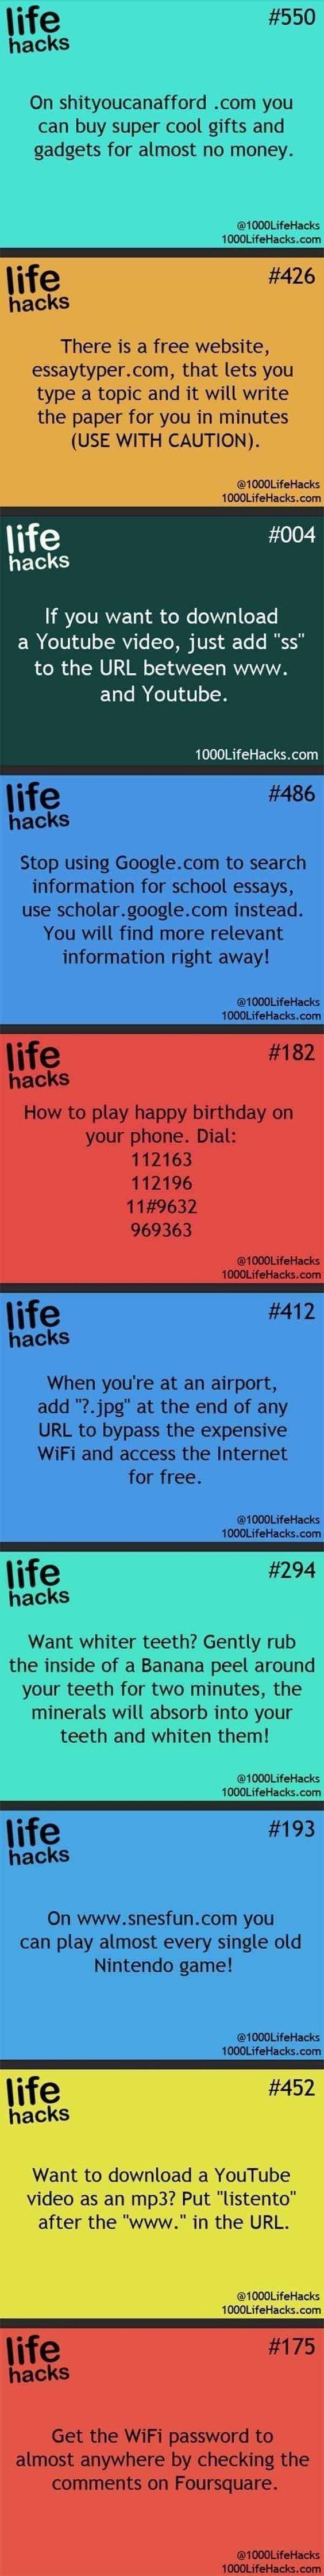 Wtf hacks#seriously